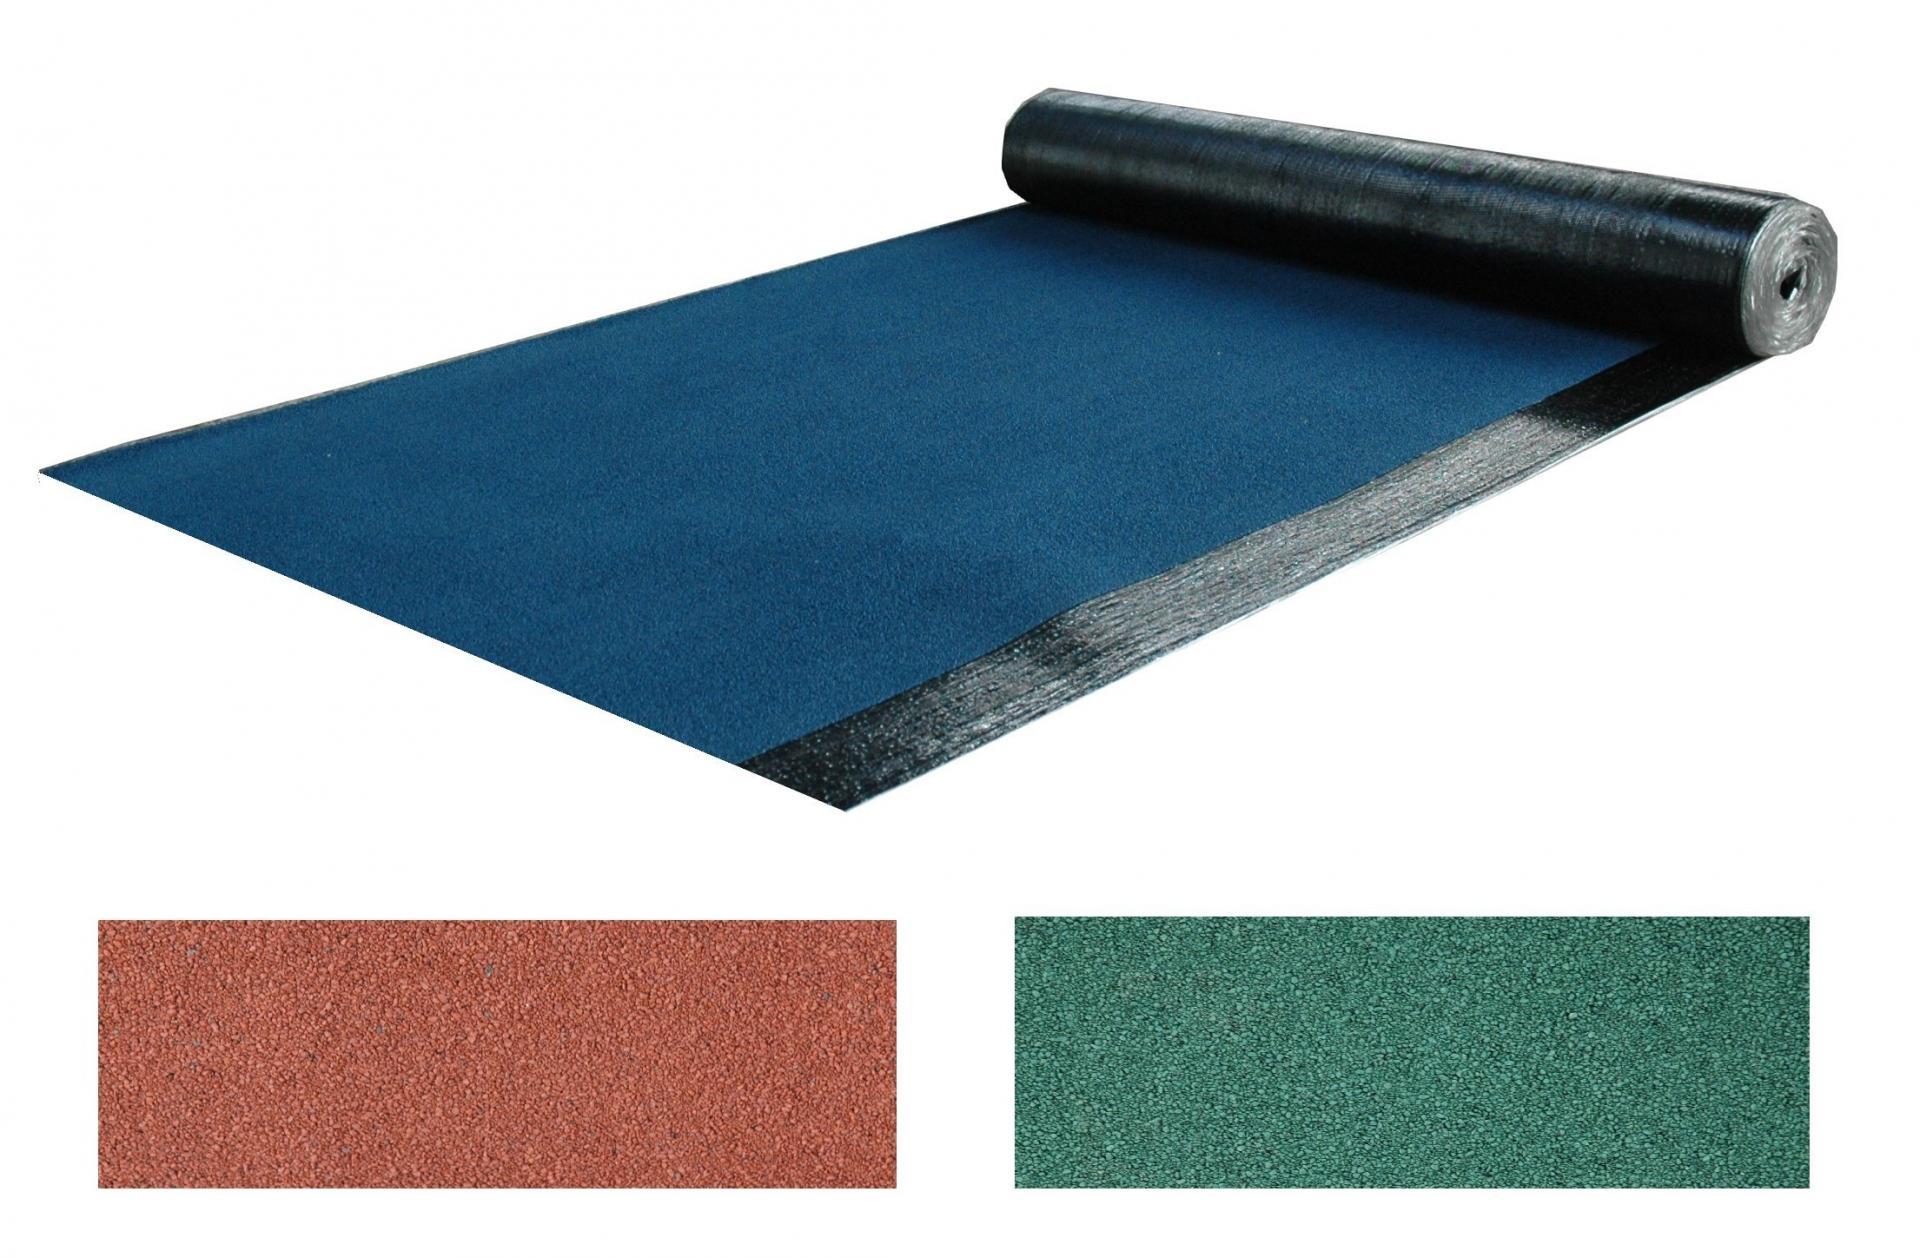 материал типа рубероида